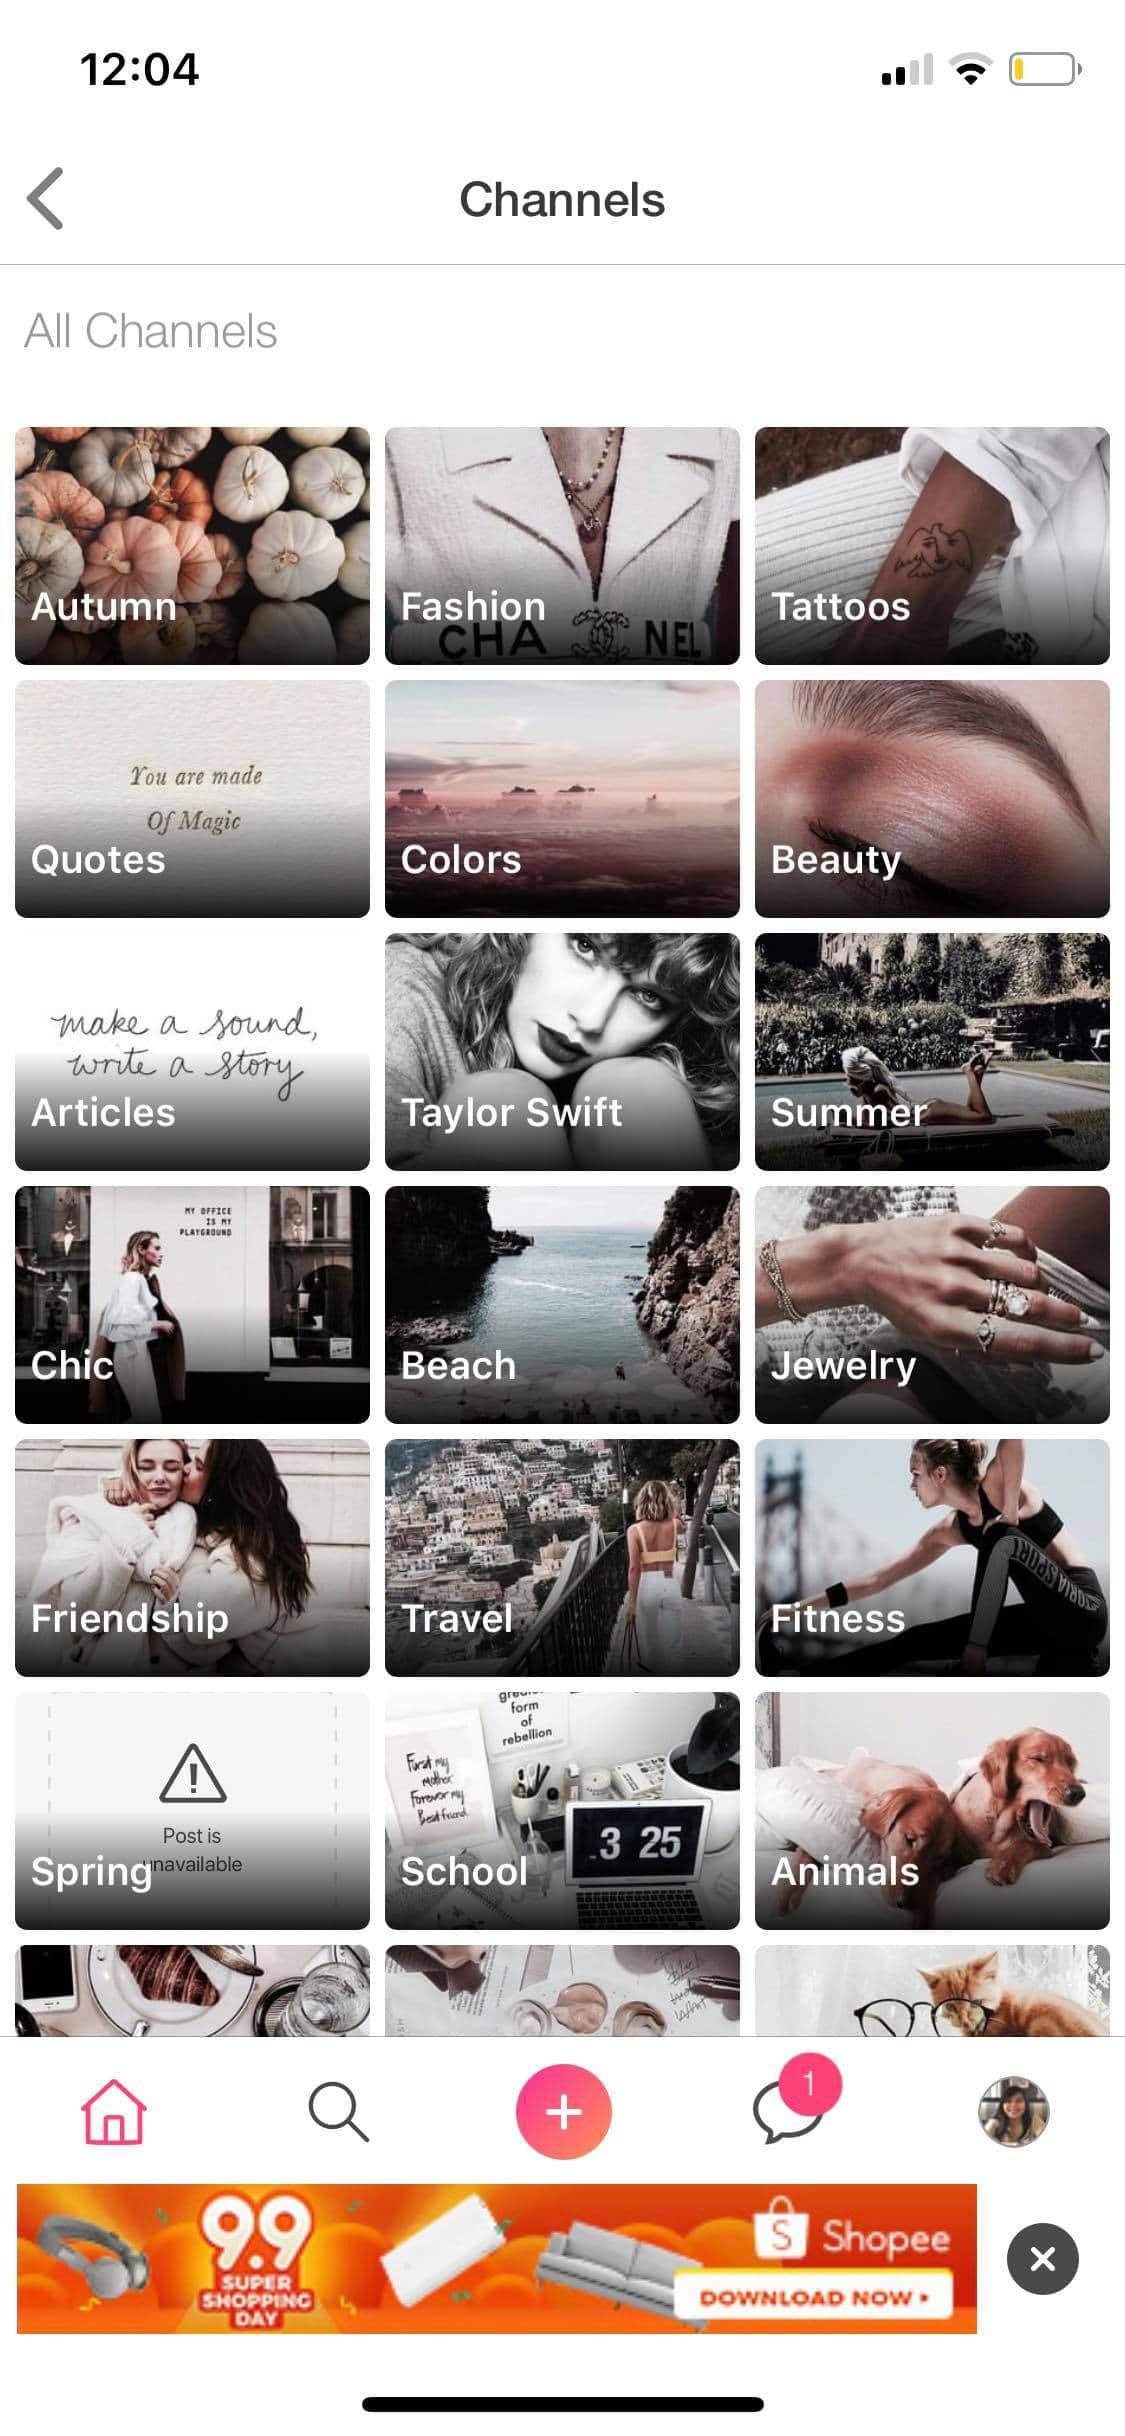 Channels on iOS by We Heart It